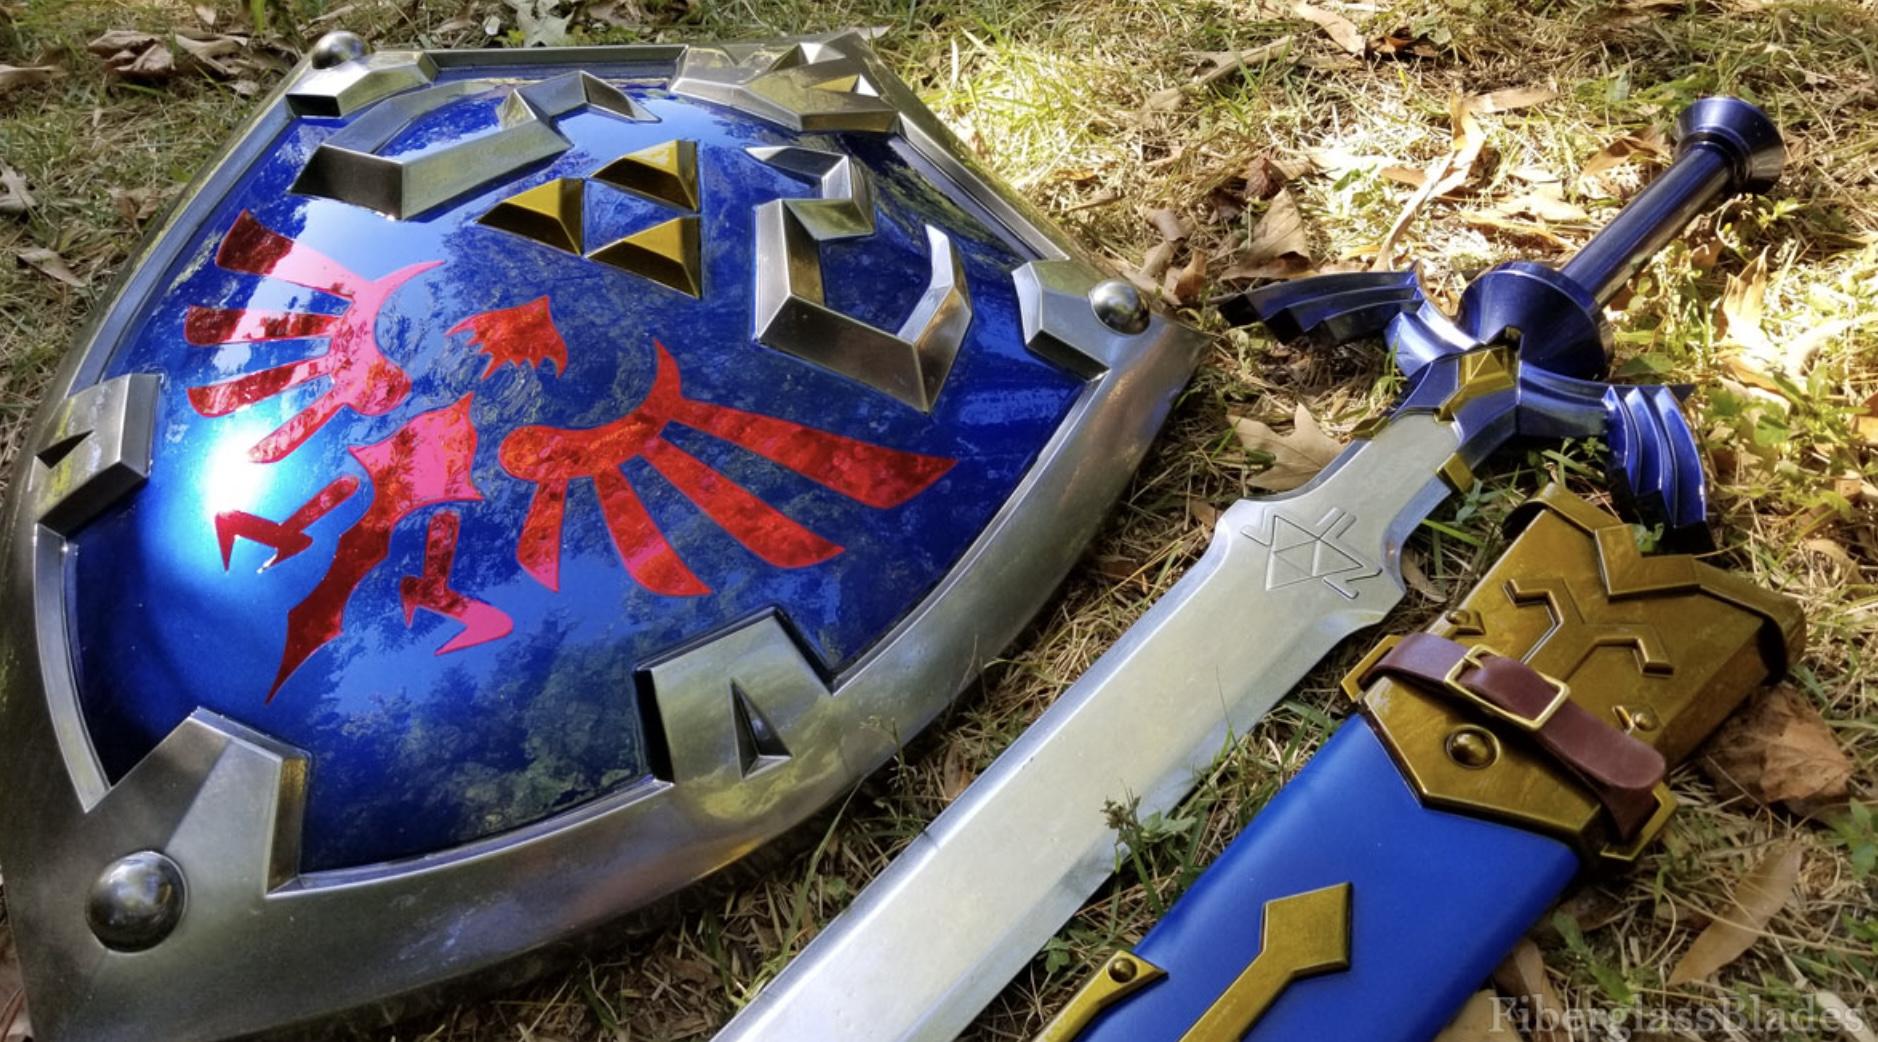 How To Get The Hylian Shield Skyward Sword